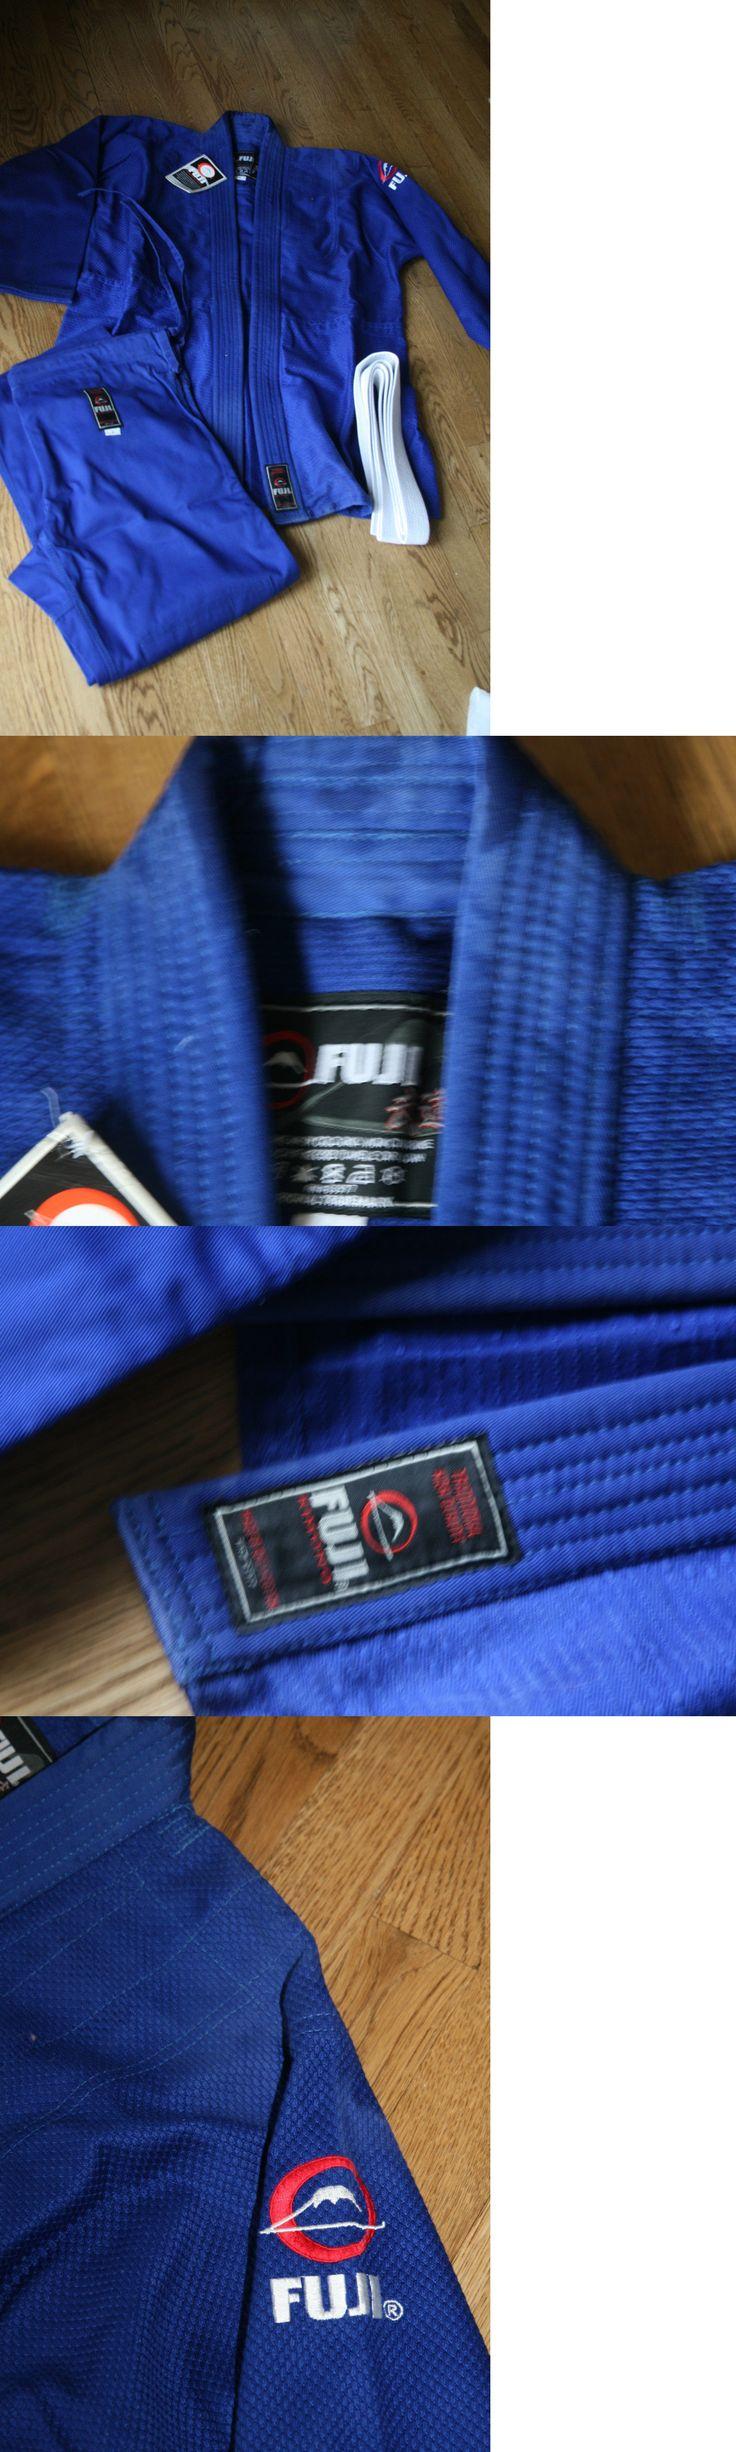 Uniforms and Gis 179774: Fuji Single Weave Judo Gi Blue Uniform W Belt Sz 8 Nwt -> BUY IT NOW ONLY: $35.99 on eBay!